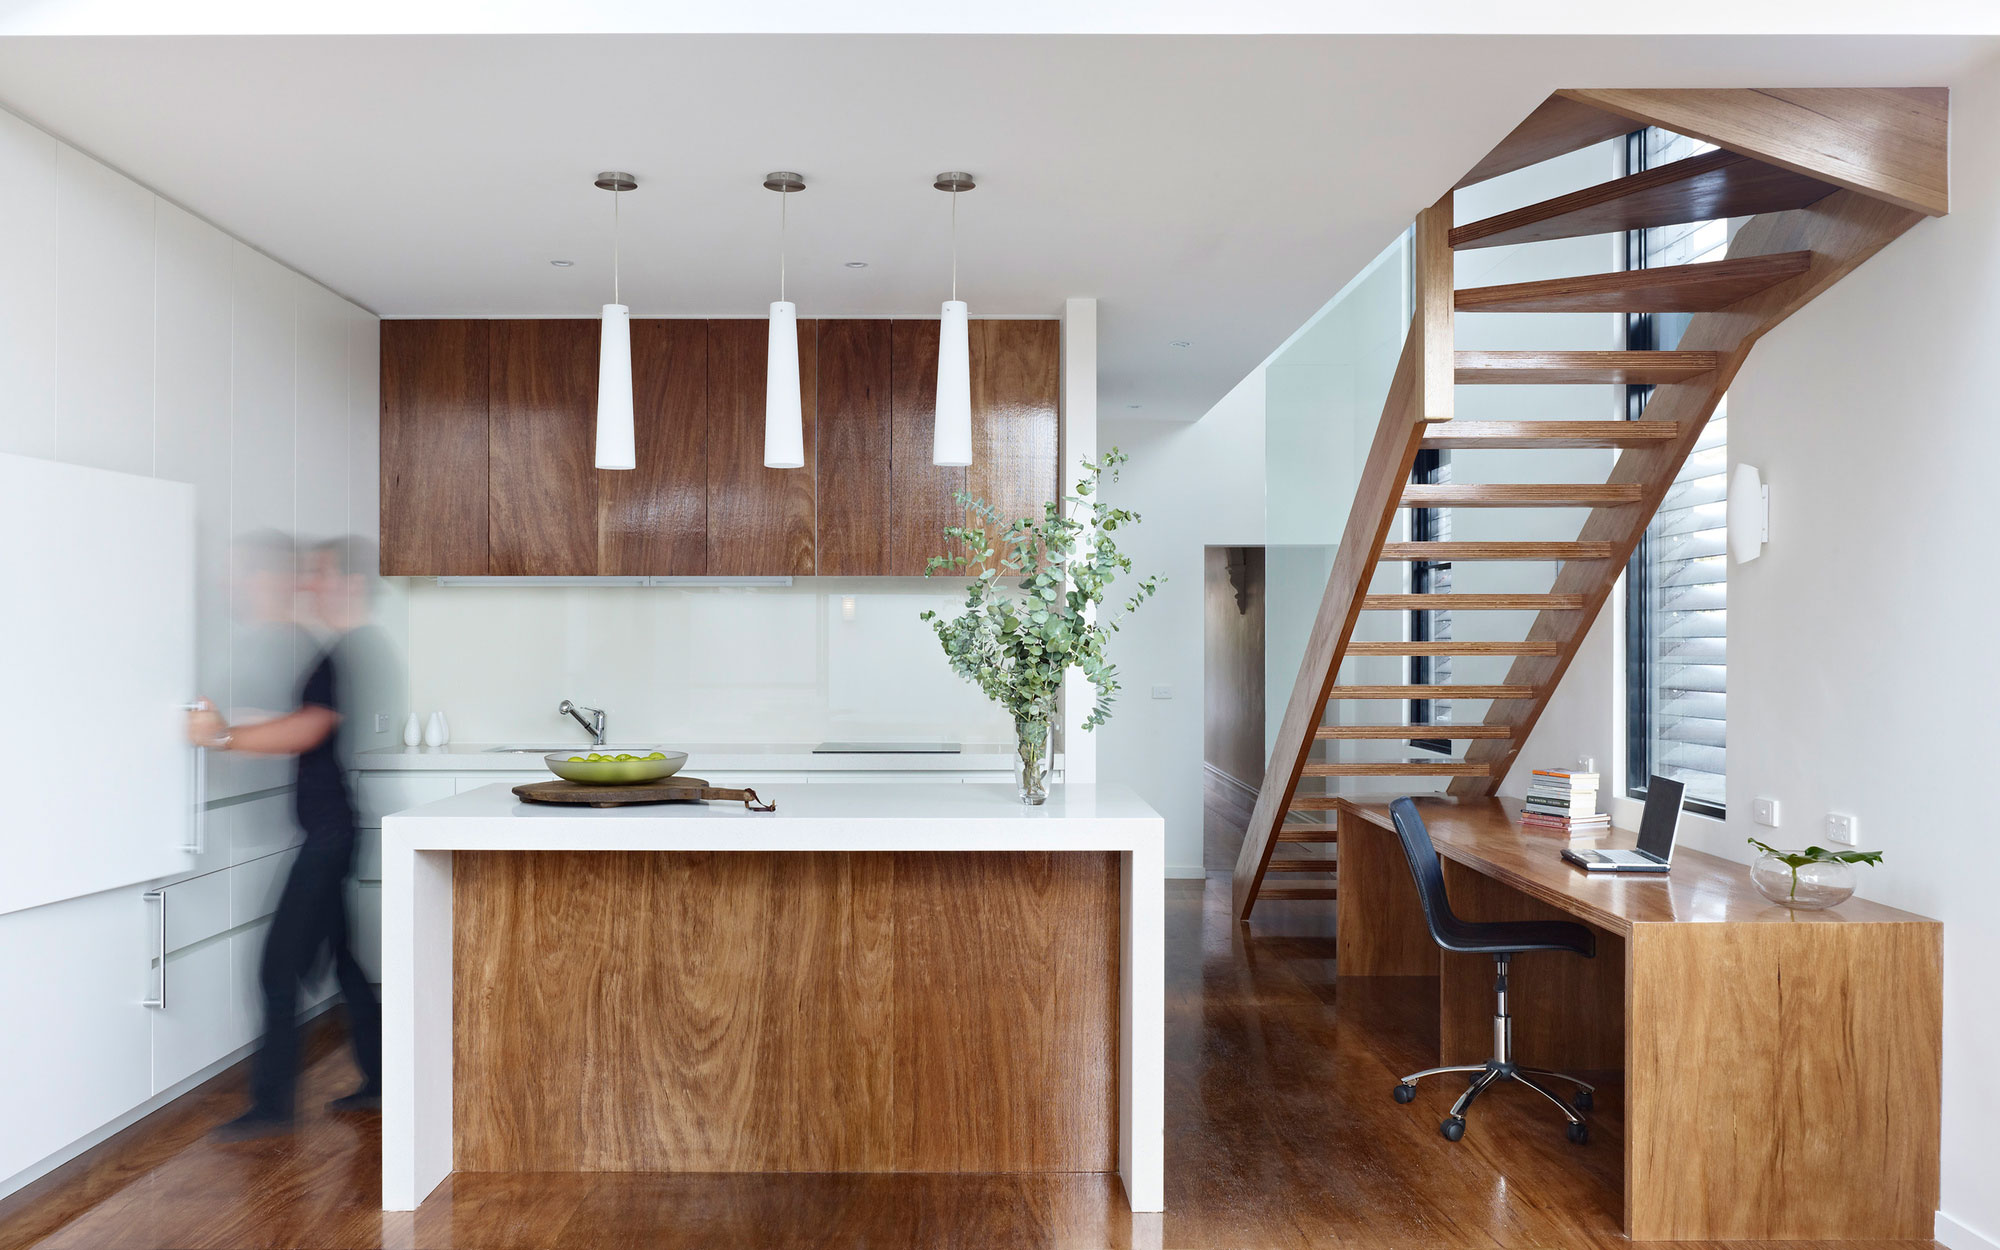 Рабочее место на кухне под лестницей.